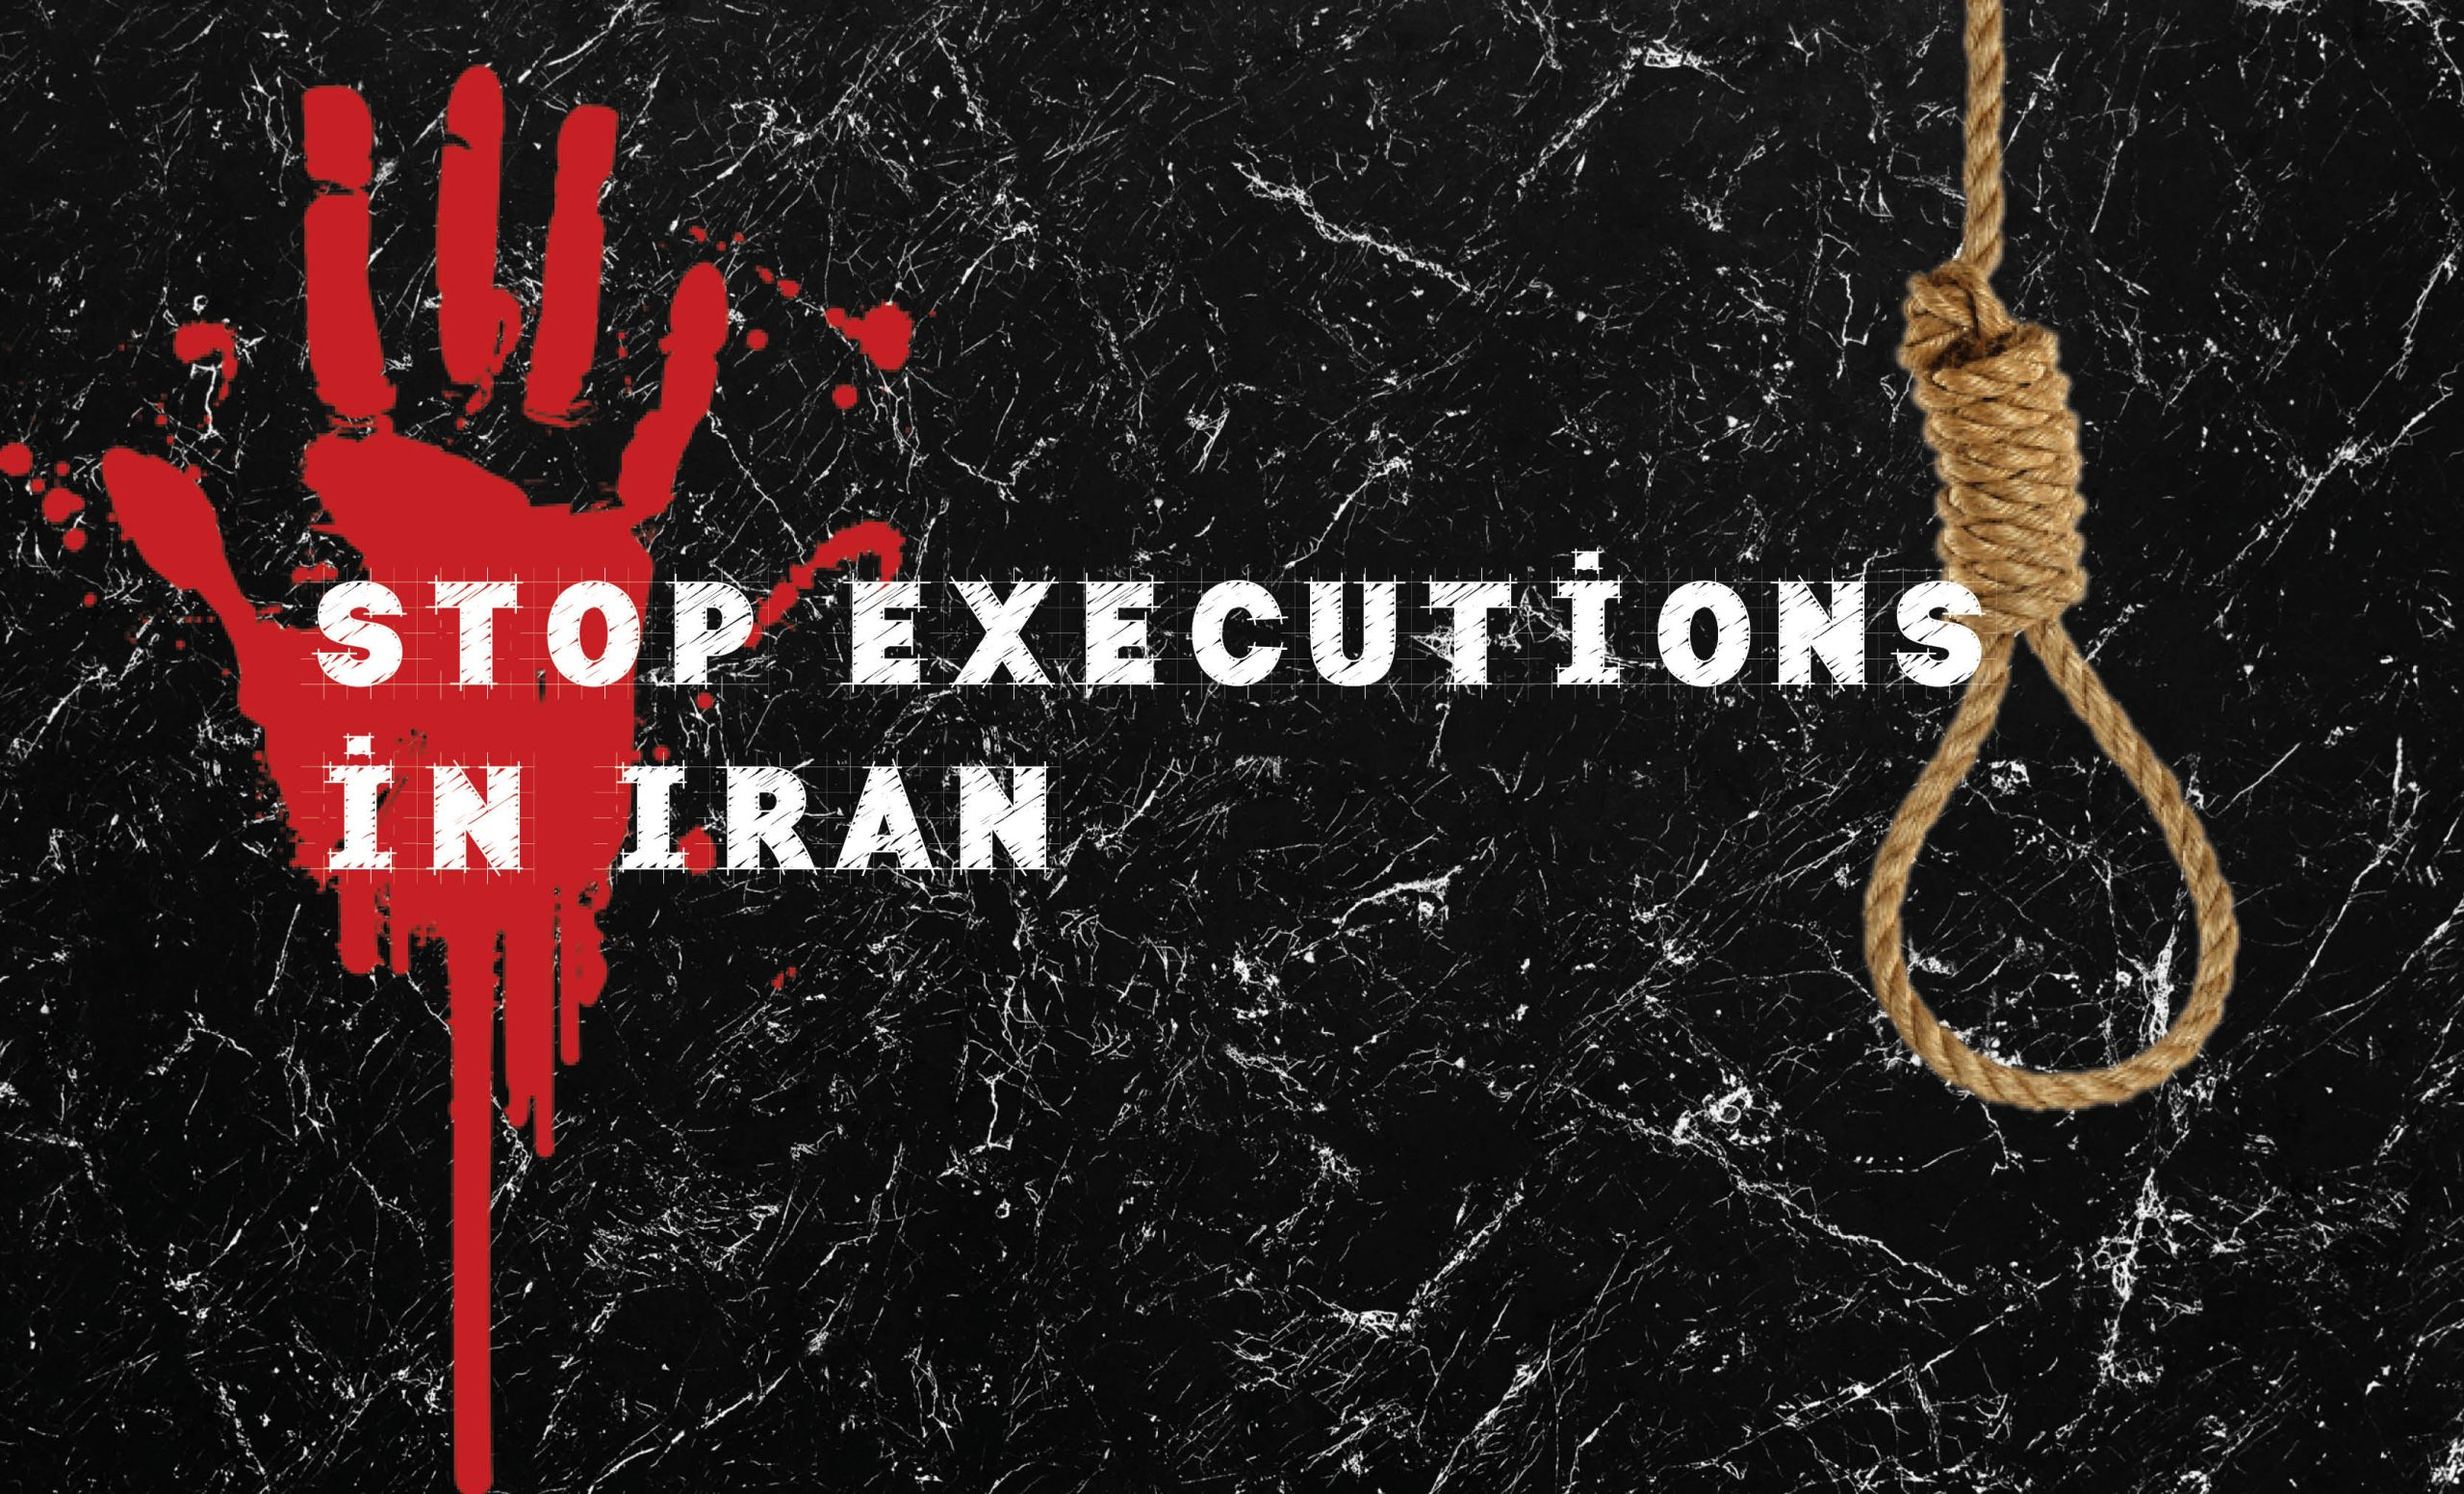 The Iranian Regime Hanged 4 person, including two women in Gohardasht prison of Karaj.